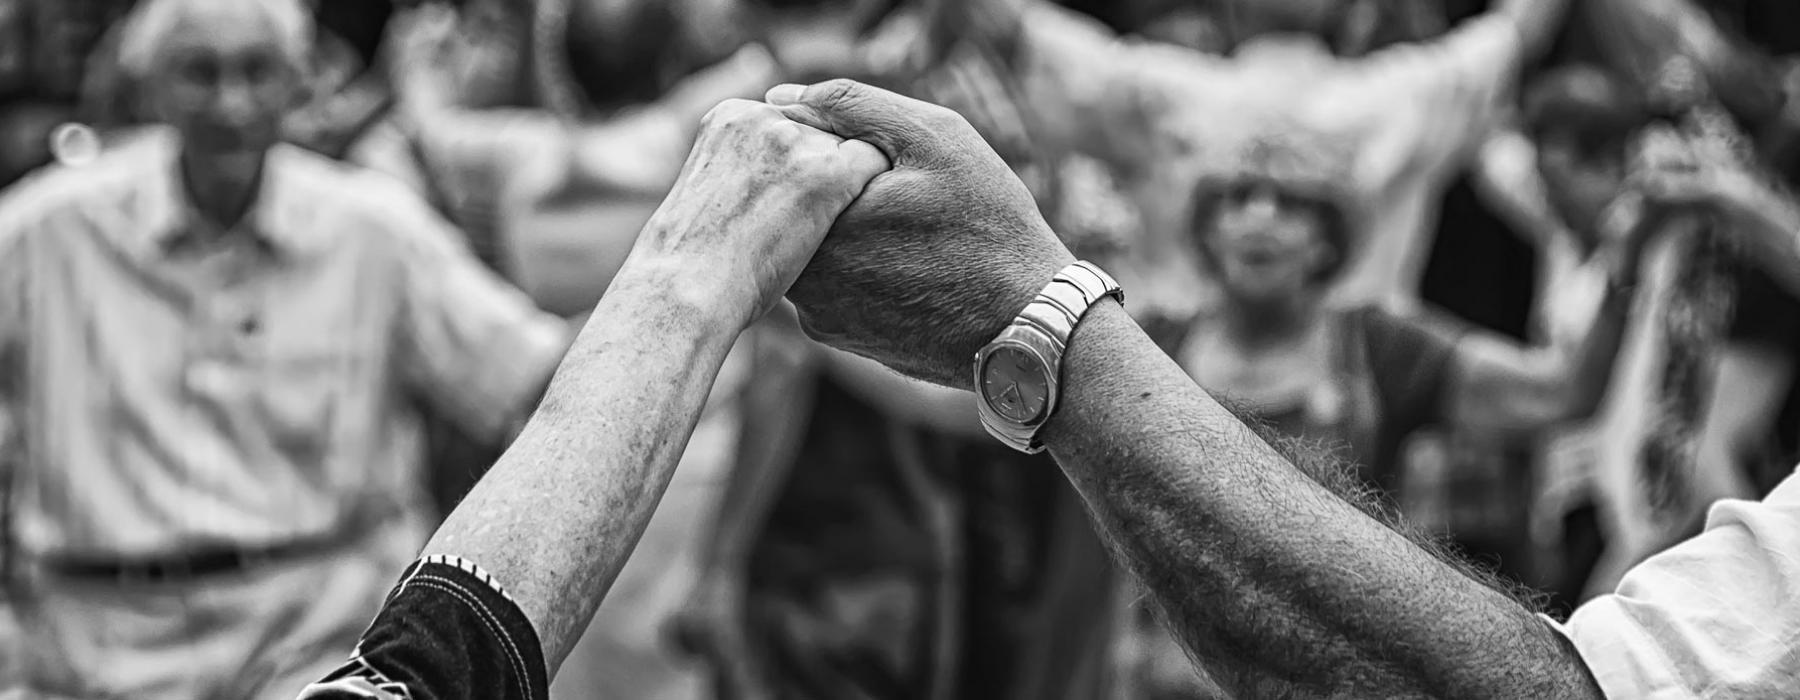 Older Adults Holding Hands